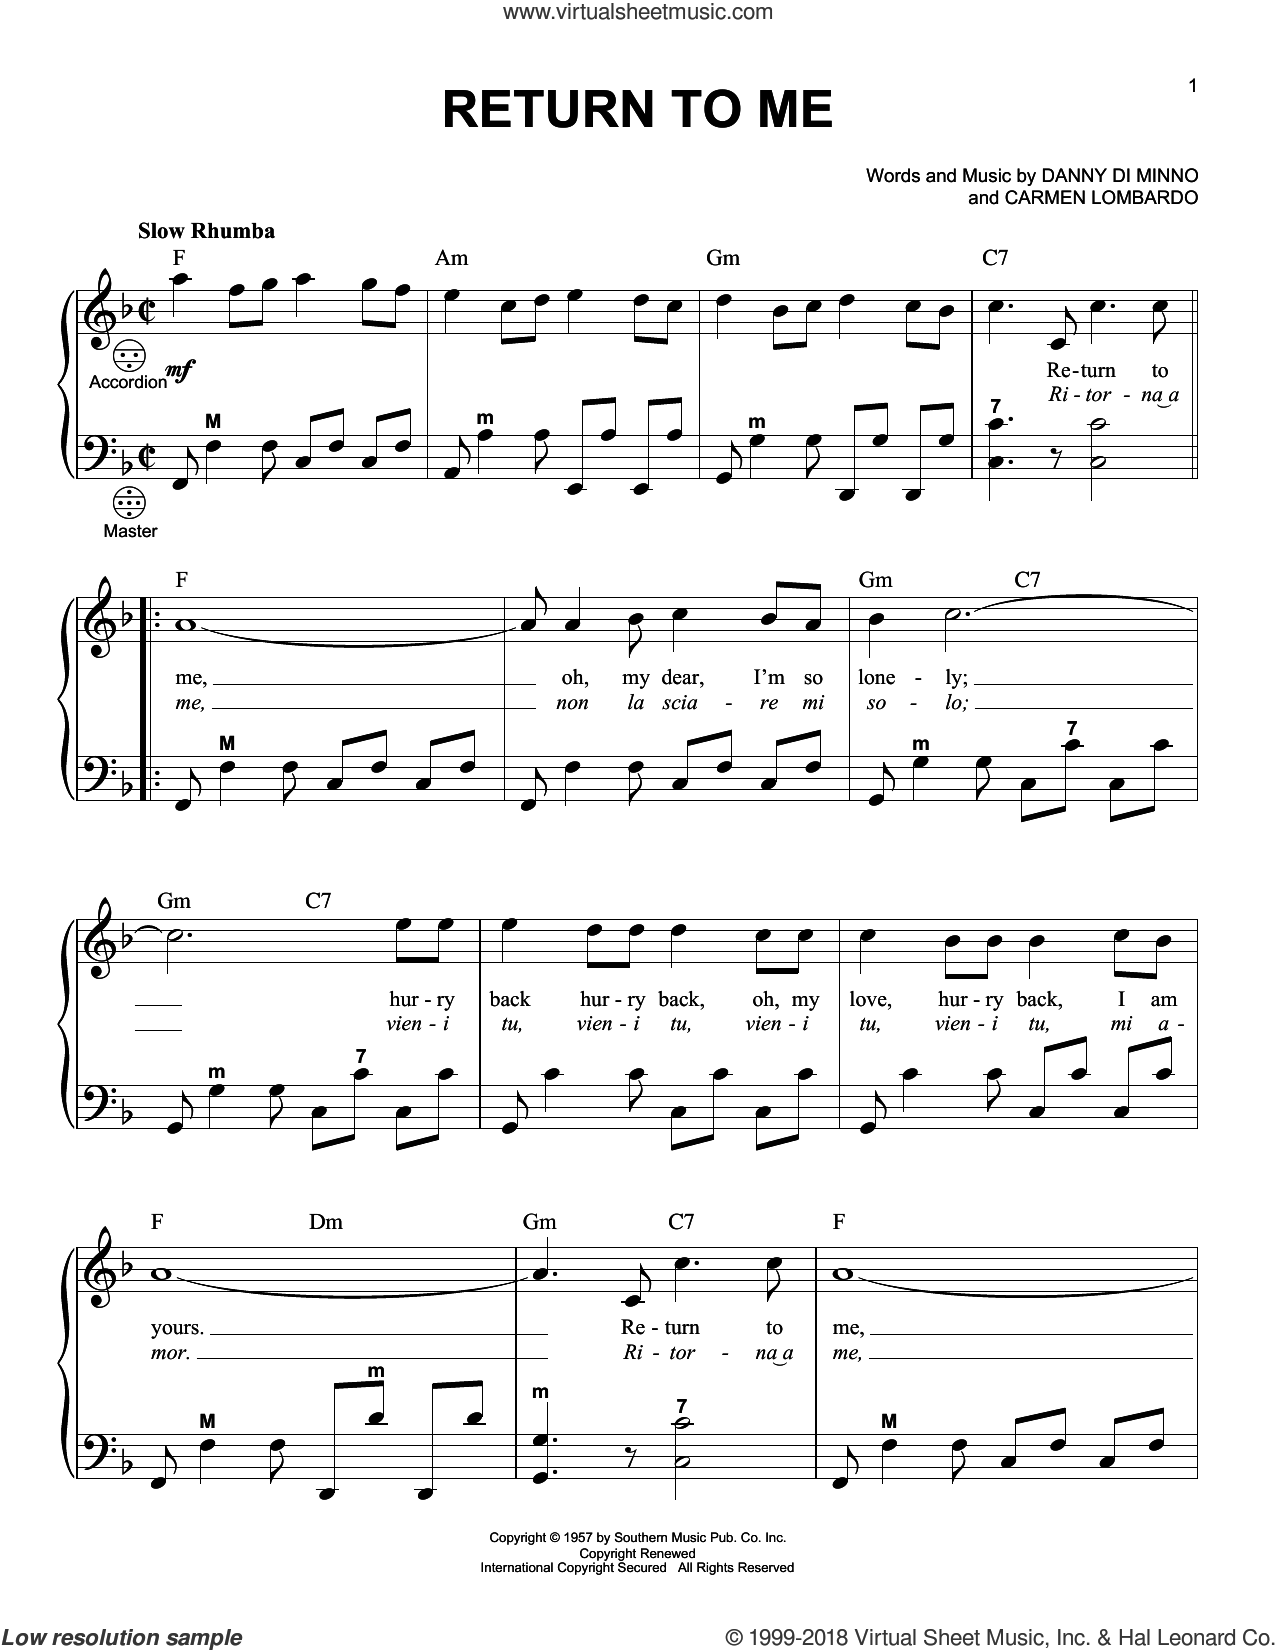 Return To Me sheet music for accordion by Gary Meisner, Carmen Lombardo and Danny Di Minno, intermediate skill level